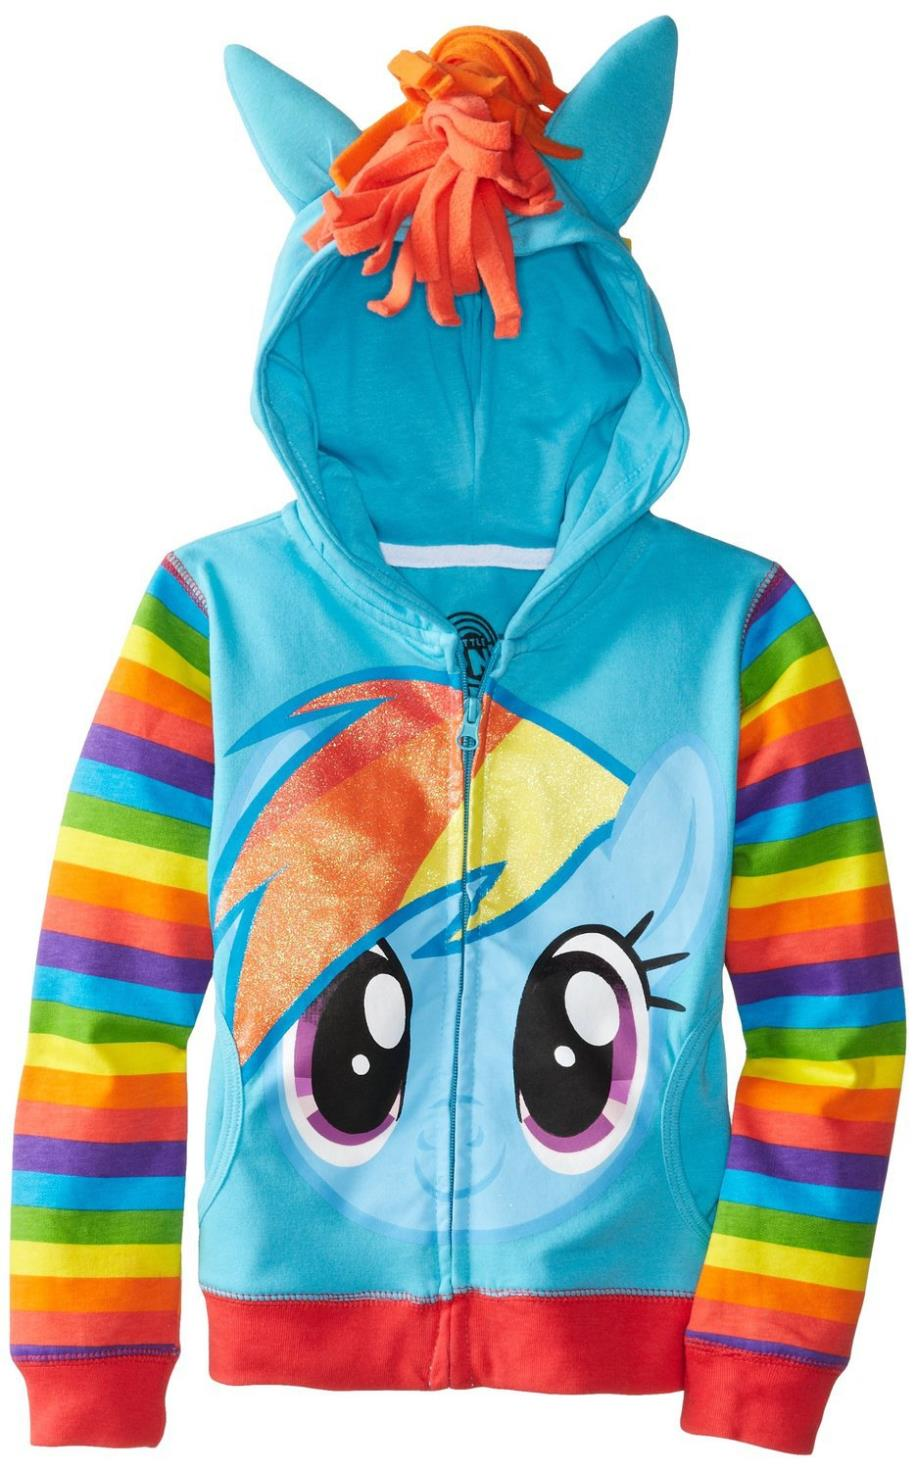 2-10y-My-Girls-Jacket-Little-Pony-Clothes-Cute-Childrens-Coat-Cartoon-Hoodies-Sweatshirts100-Cotton-Children-Baby-Clothing-3